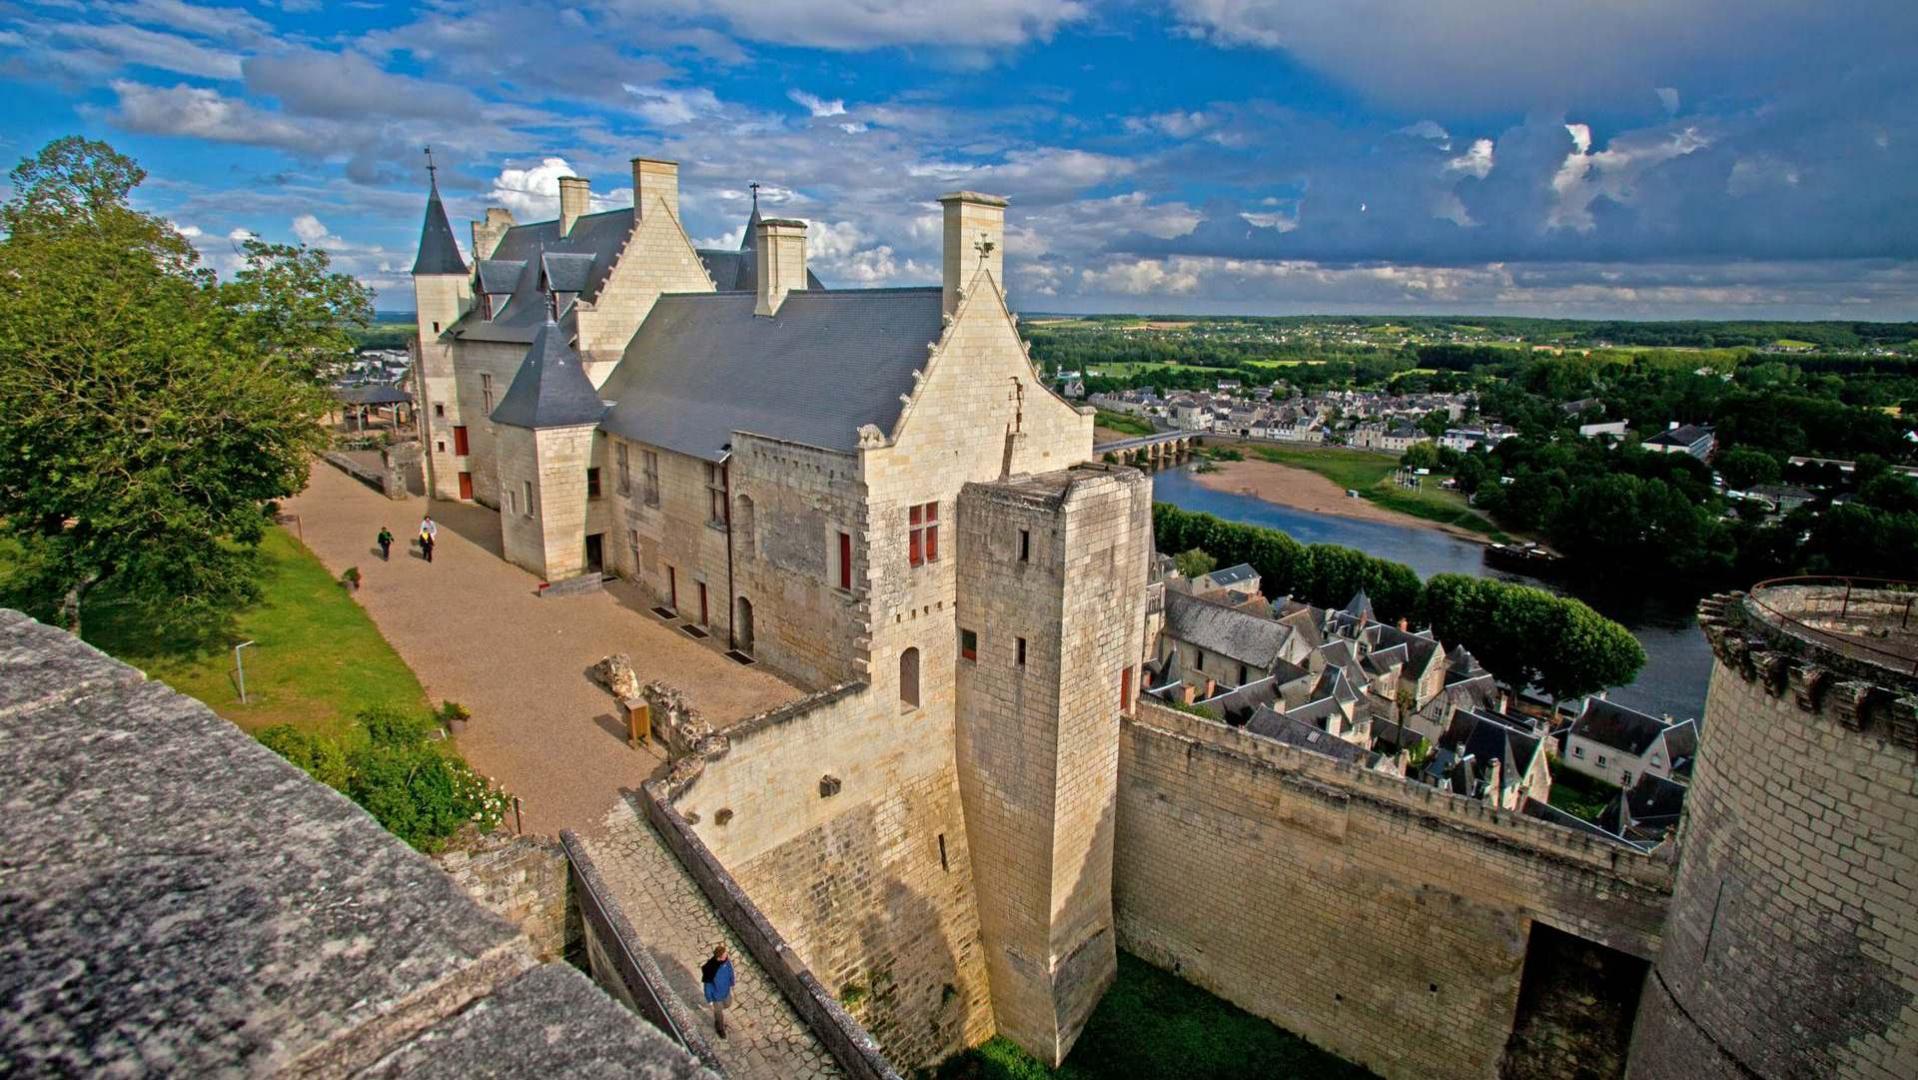 Château_de_Chinon_castle_France_Shinon